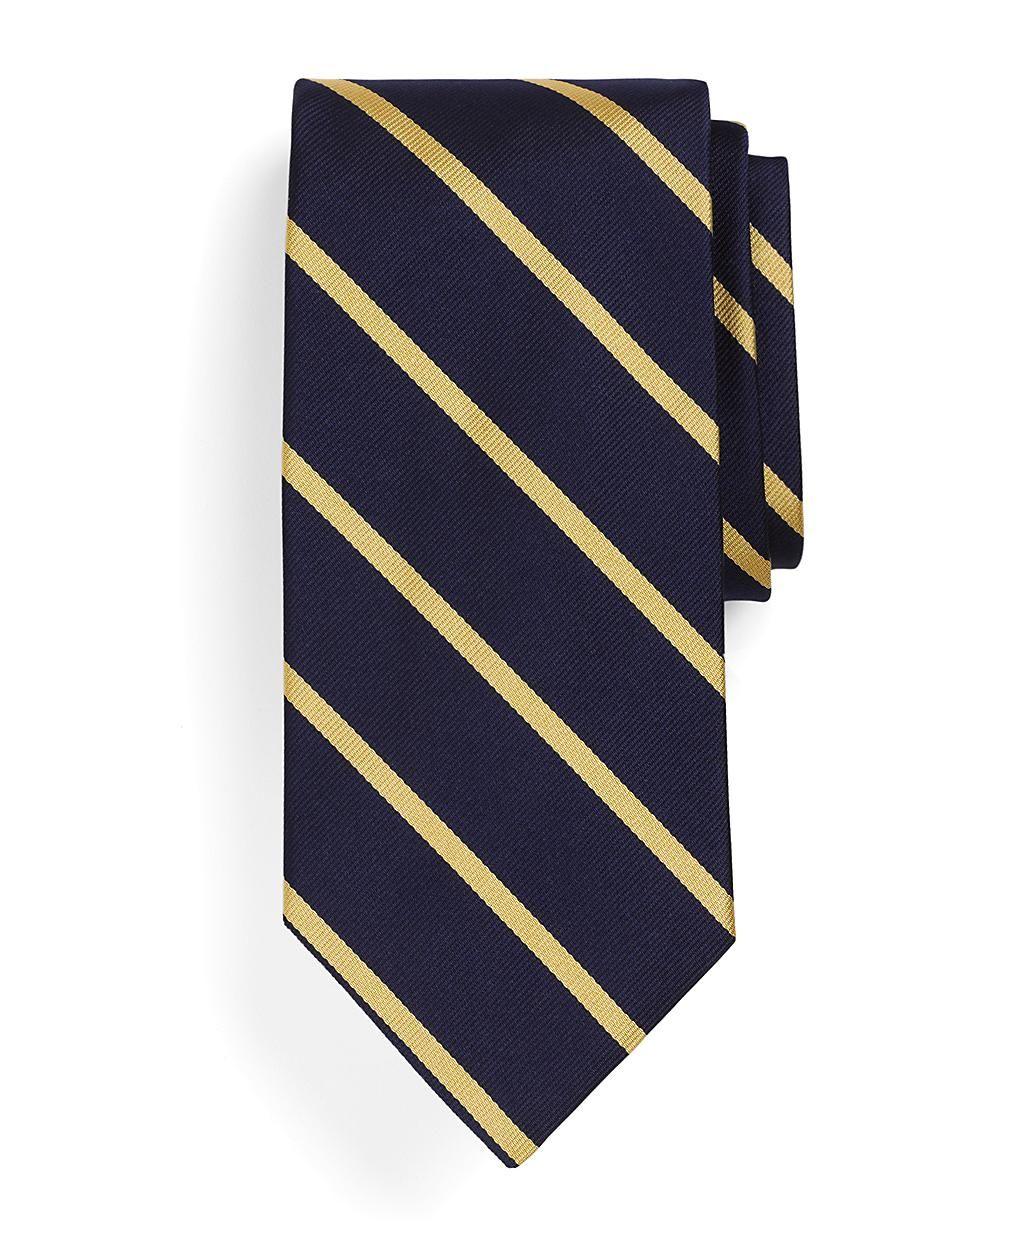 298199fbd157 BB#3 Repp Tie | Brooks Brothers | Gorge! | Tie, Brooks brothers ...